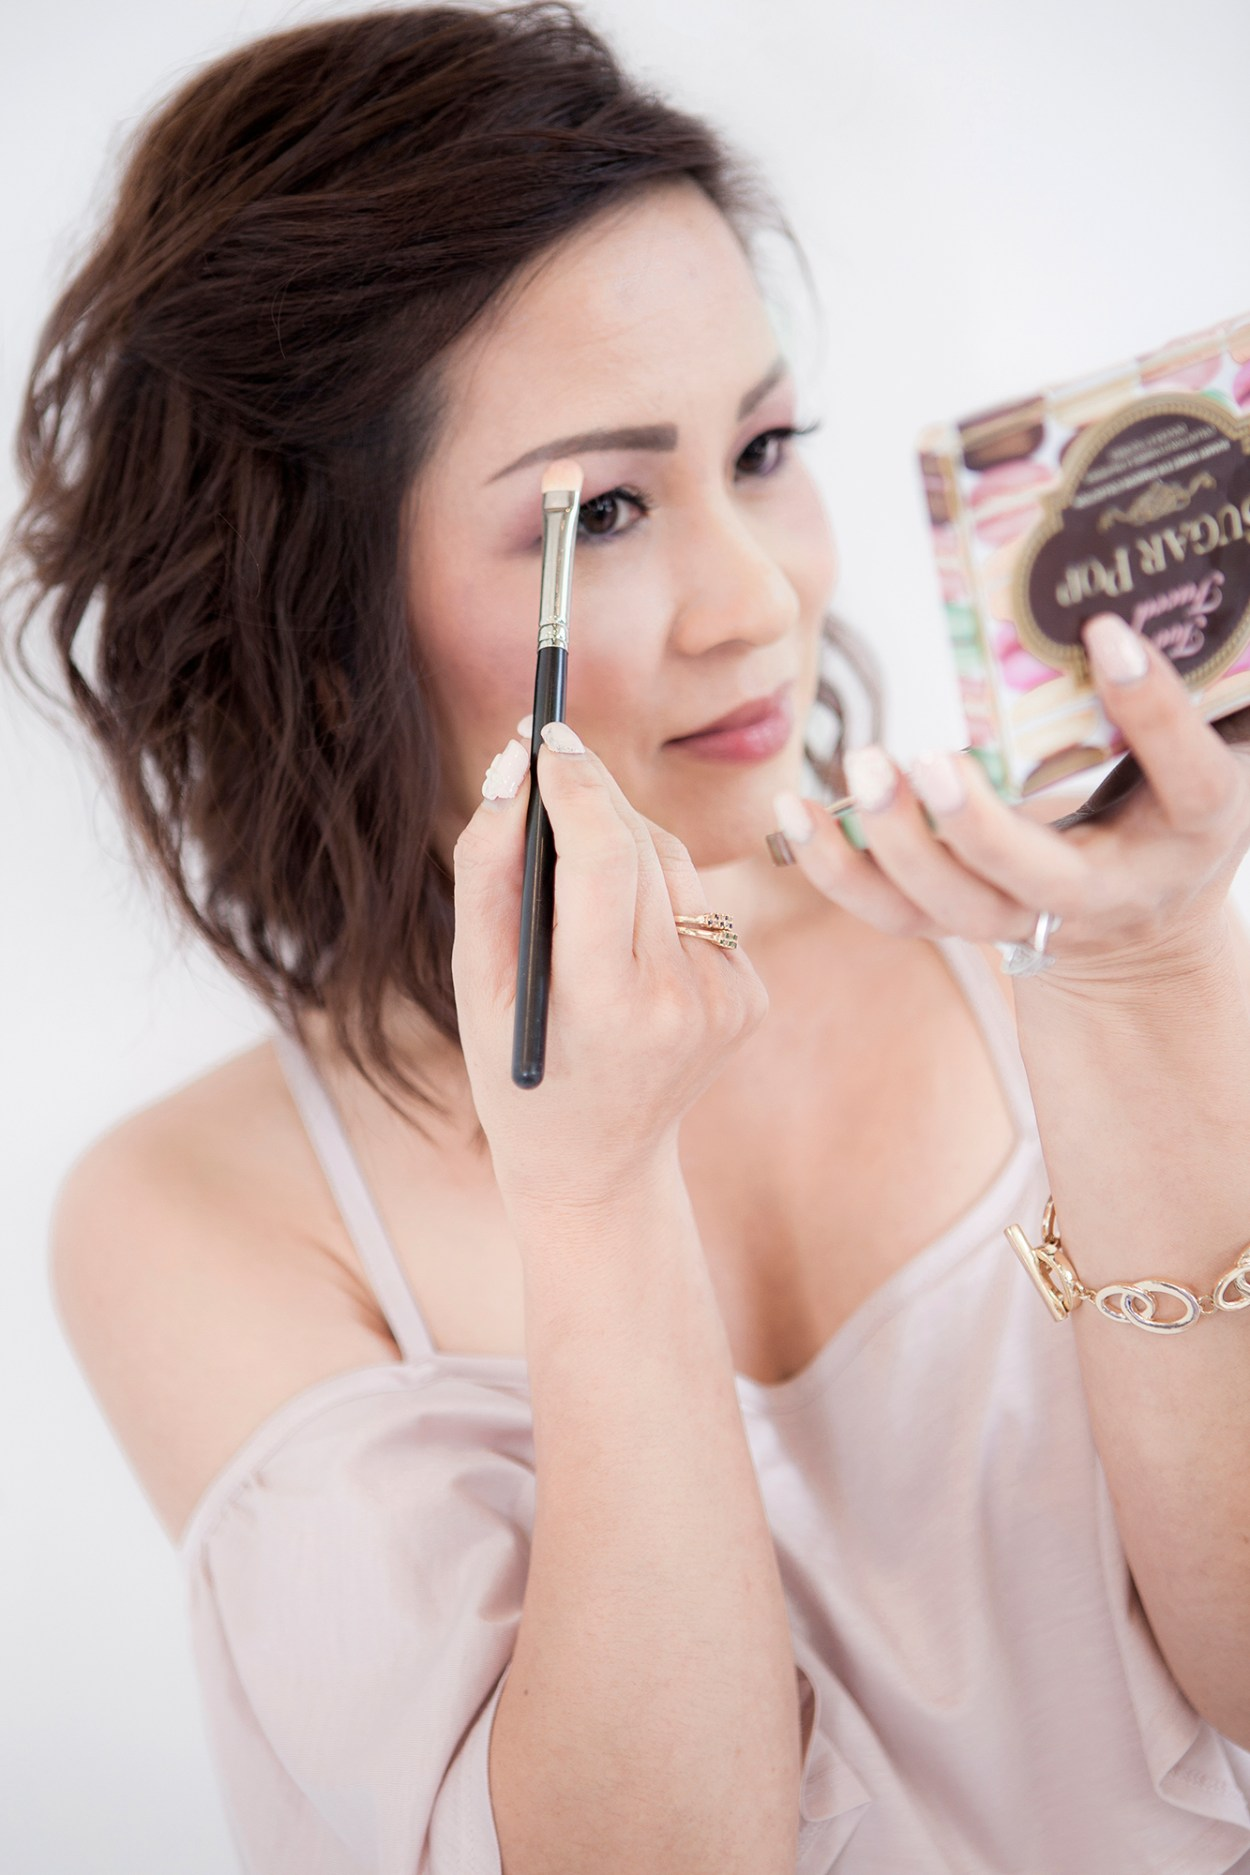 10-Makeup-Fashion-Style-Tarte-Urban-Decay-SugarPop-Beauty